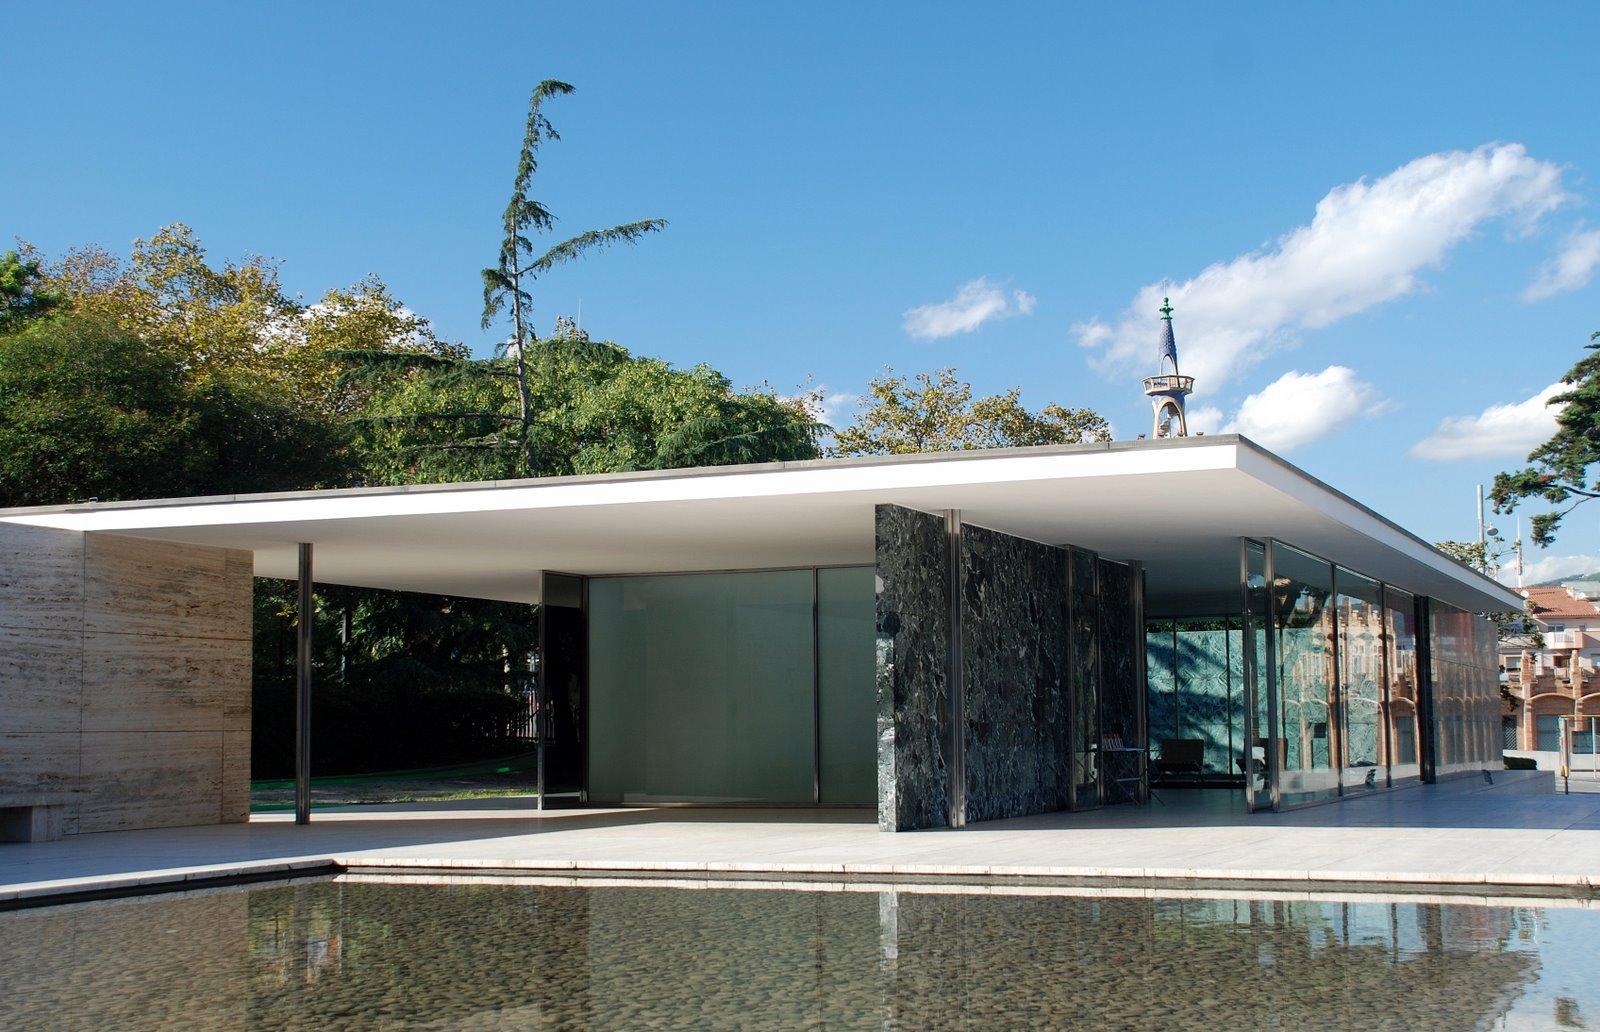 Barcelona Pavilion, Ludwig Mies van der Rohe, 1929